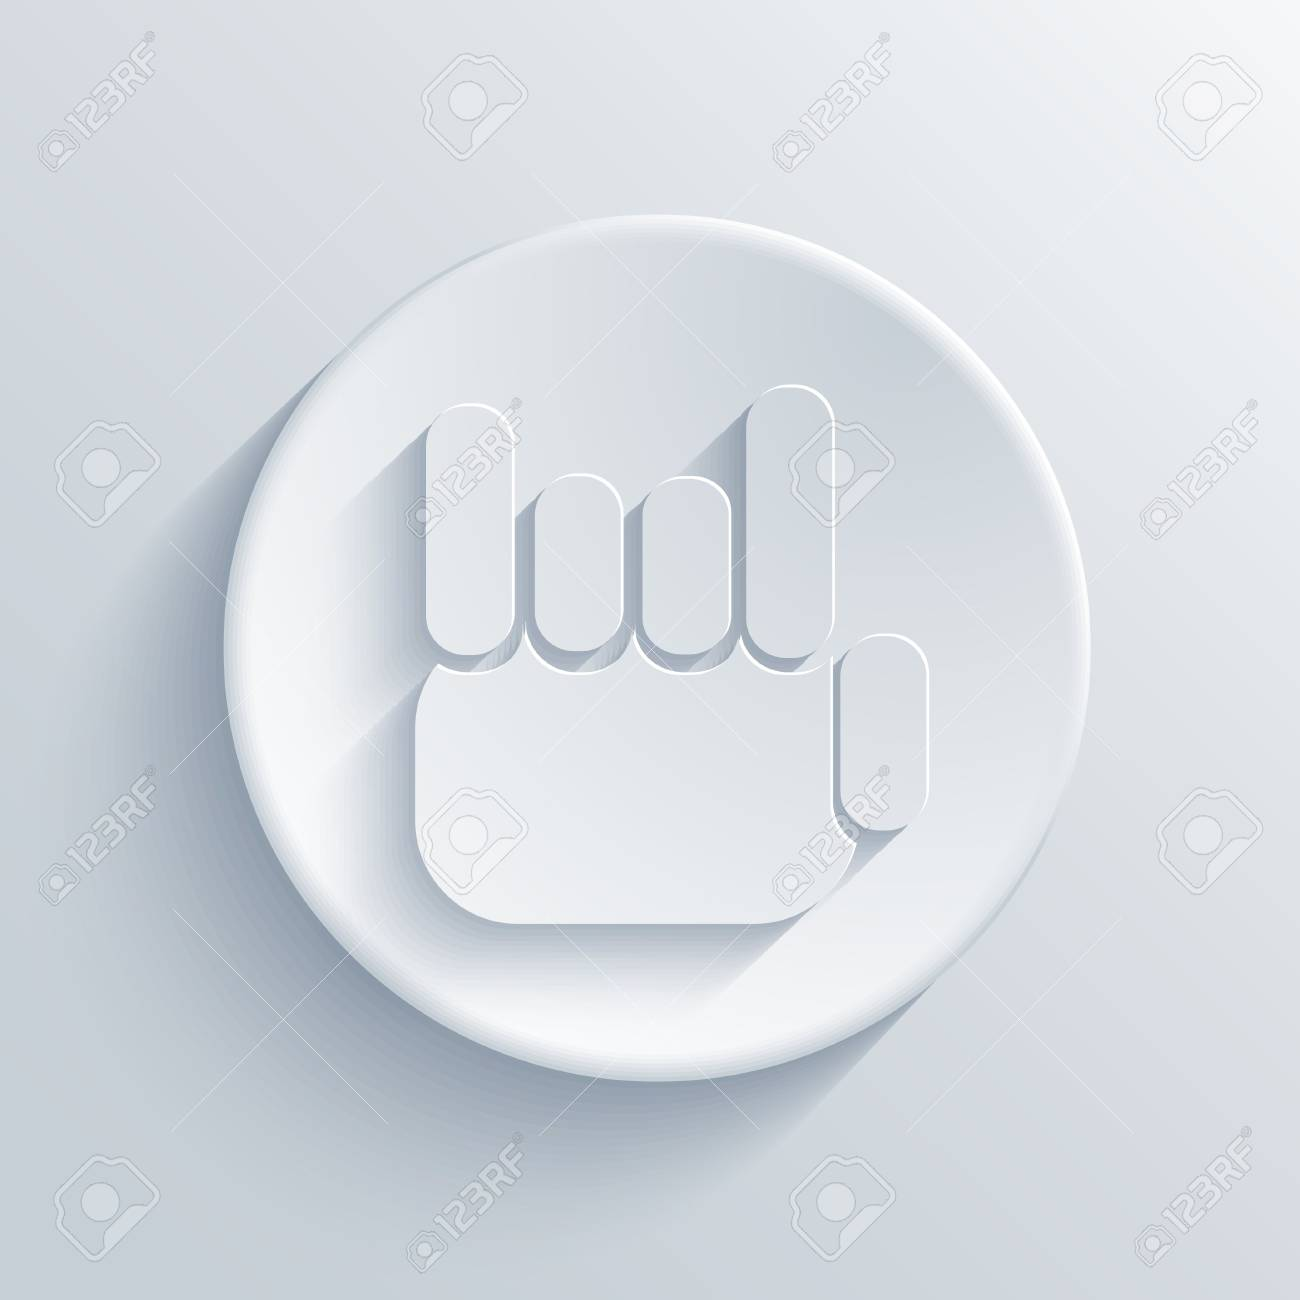 light circle icon. Stock Vector - 18666757